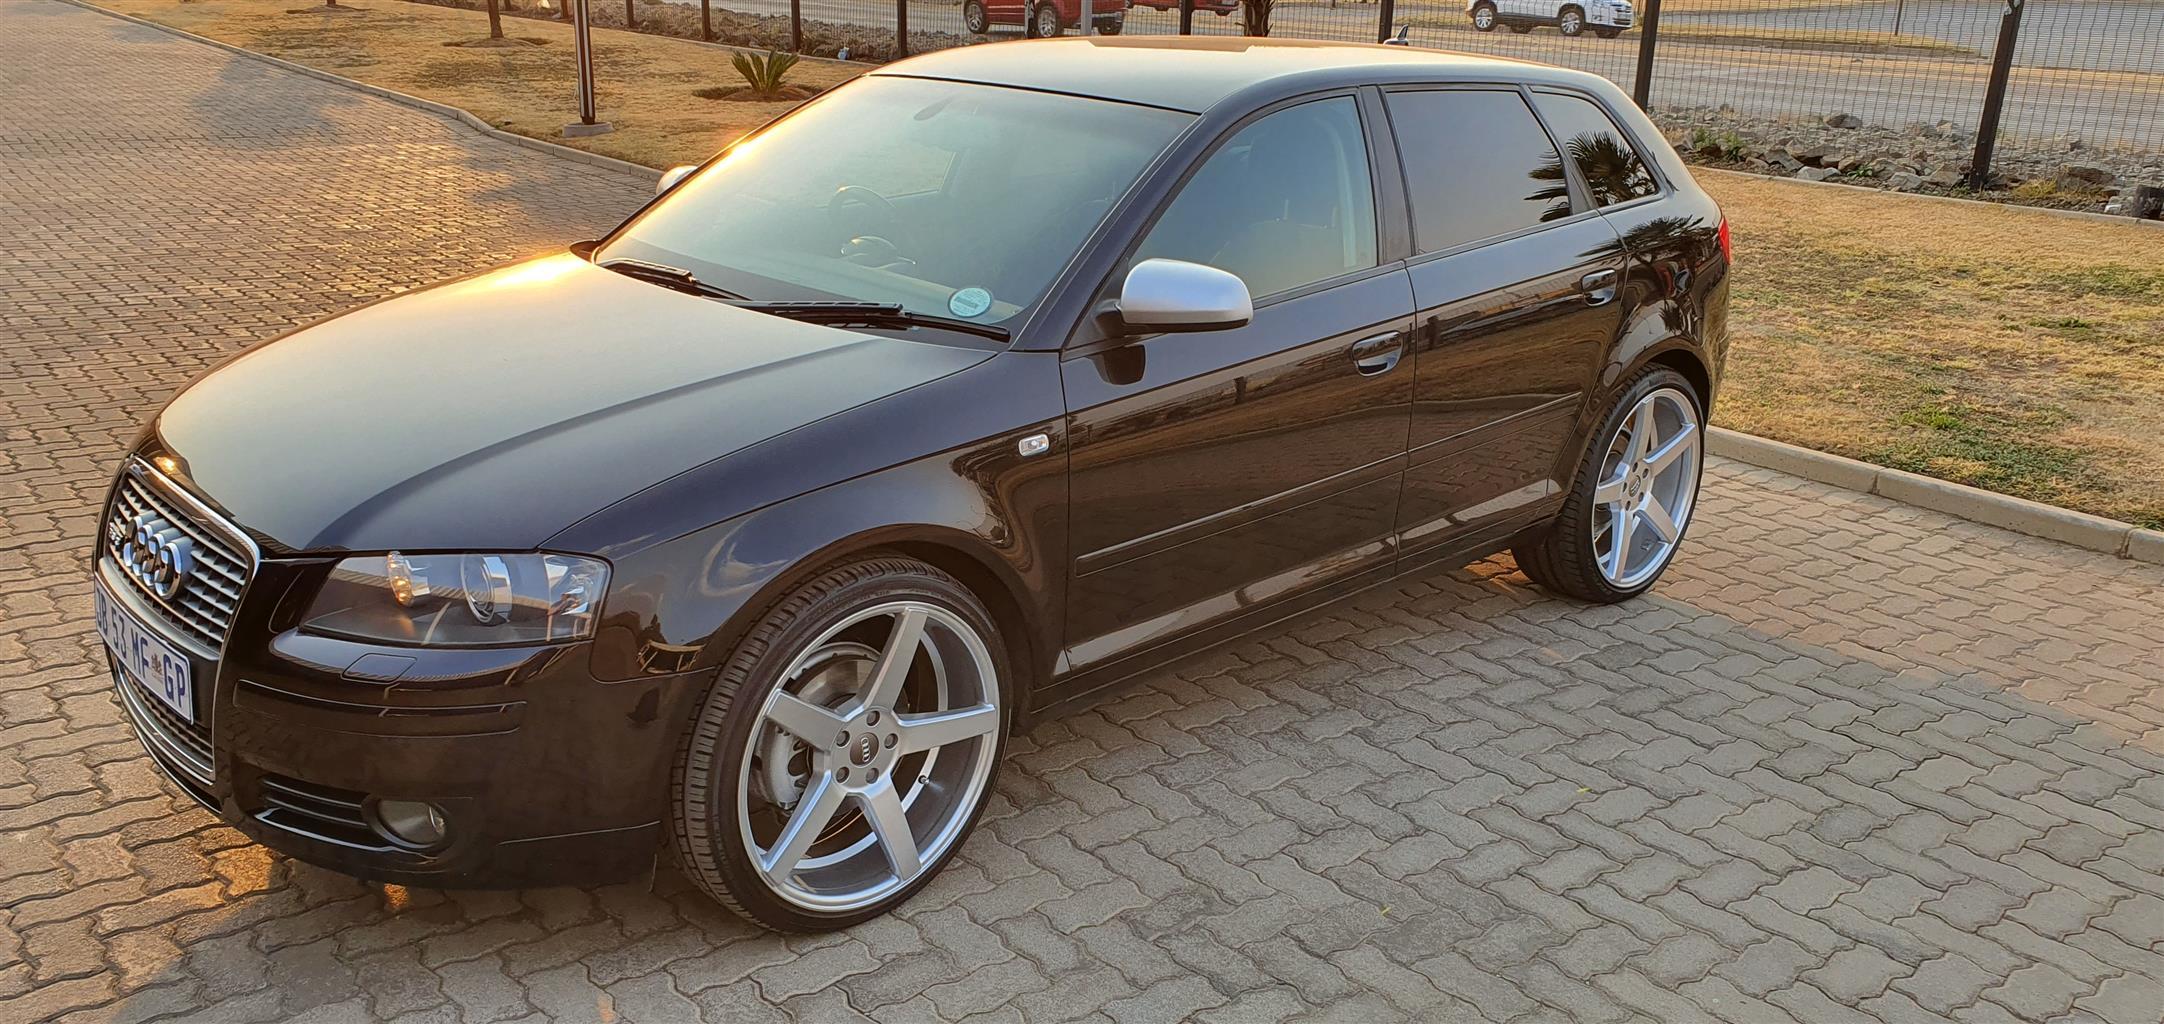 Kekurangan Audi A3 Ambition Harga